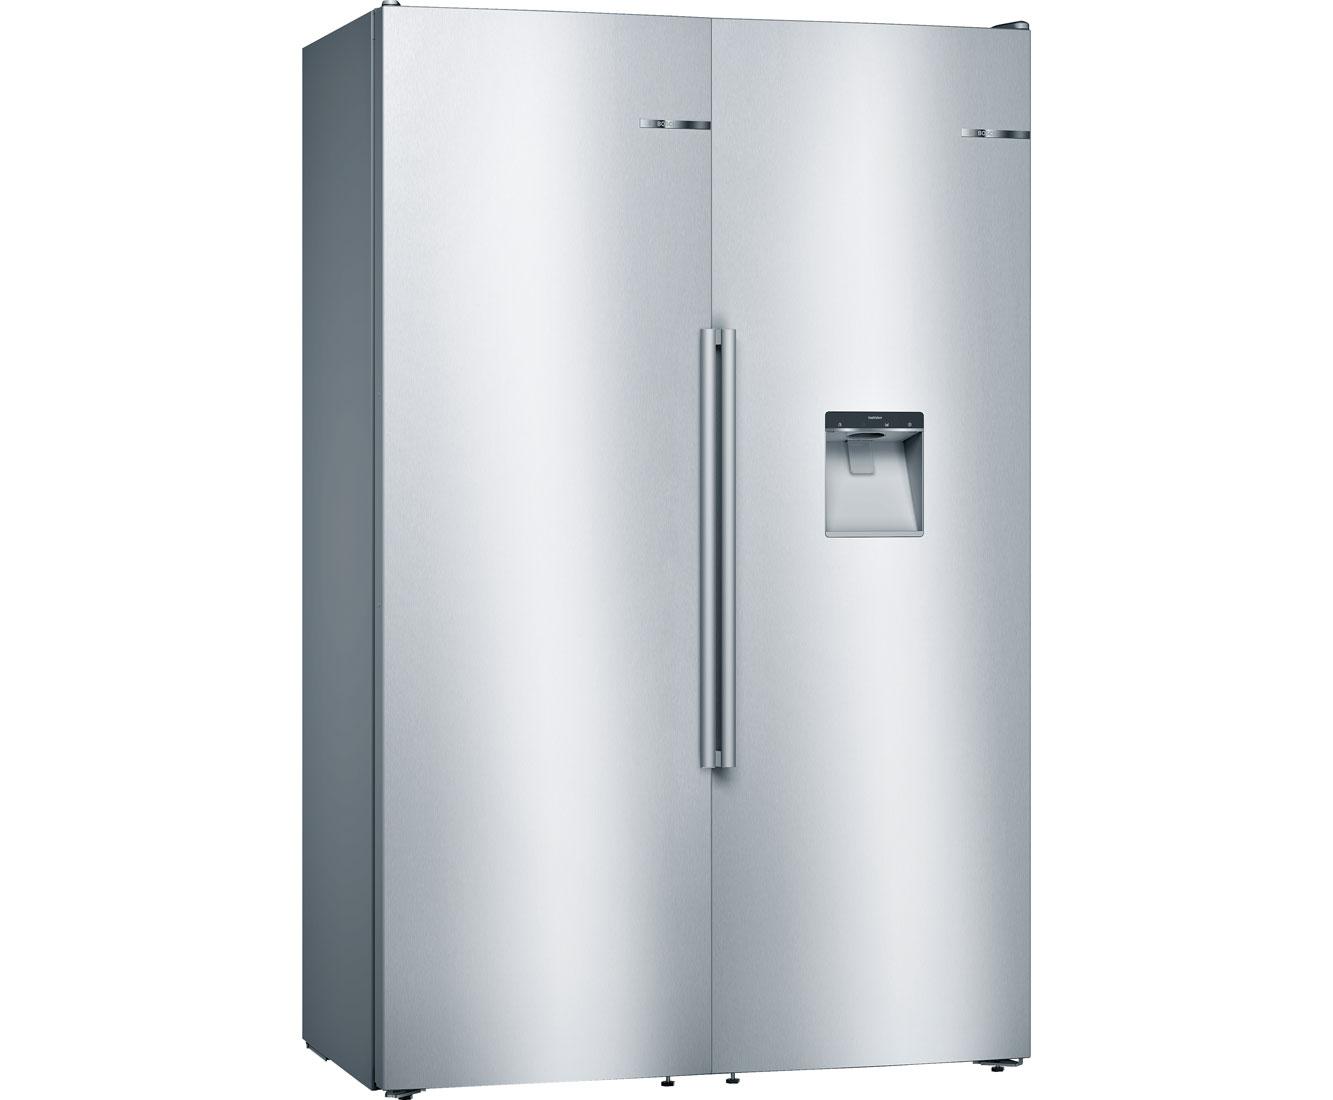 Smeg Kühlschrank Pastellgrün : Smeg kühlschrank saturn designer khlschrank freistehend cool